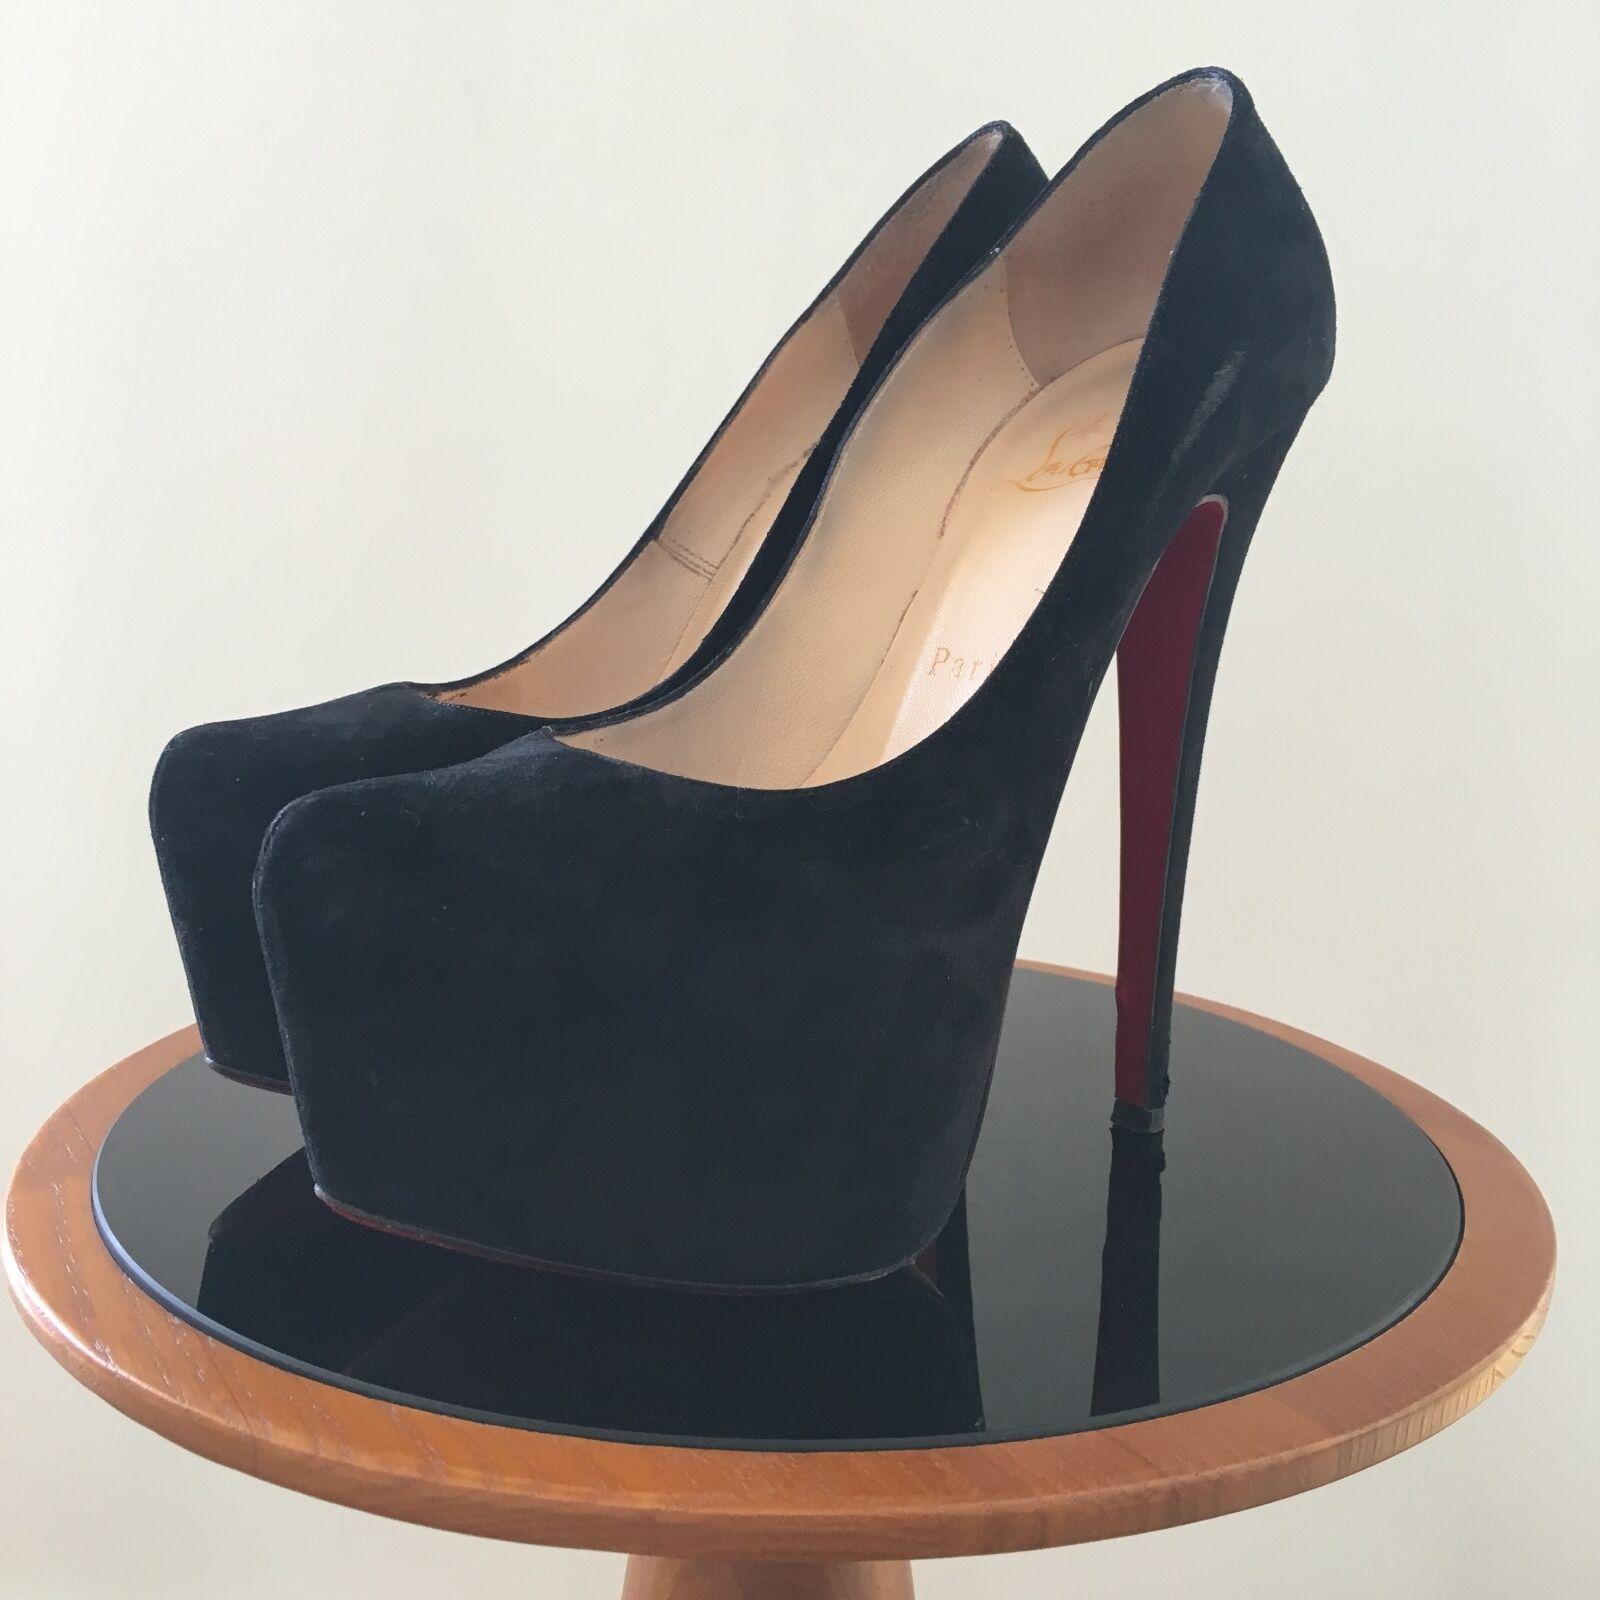 Descuento de liquidación Christian Louboutin Daffodile 160, Black SUEDE Heels, 36